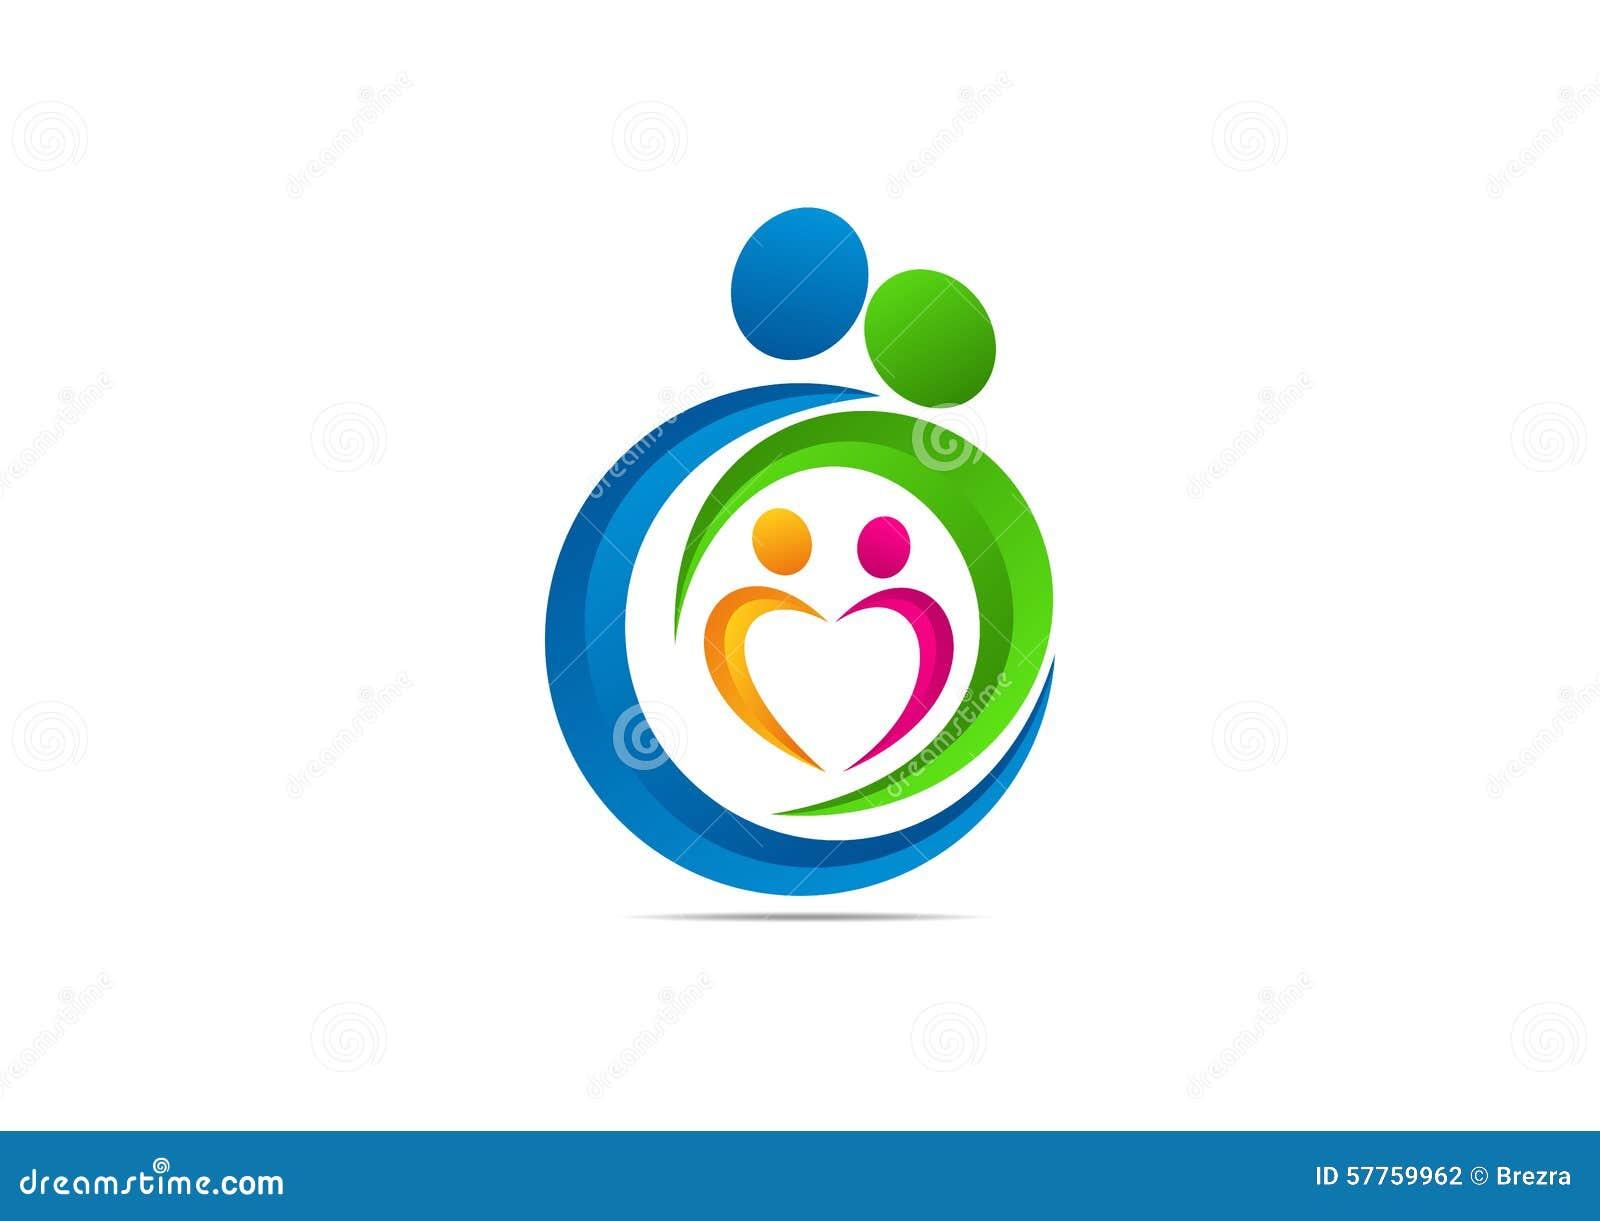 LOGOTIPO DE LA FAMILIA, DISEÑO DEL SÍMBOLO DEL PARENTING DEL CONCEPTO DEL AMOR